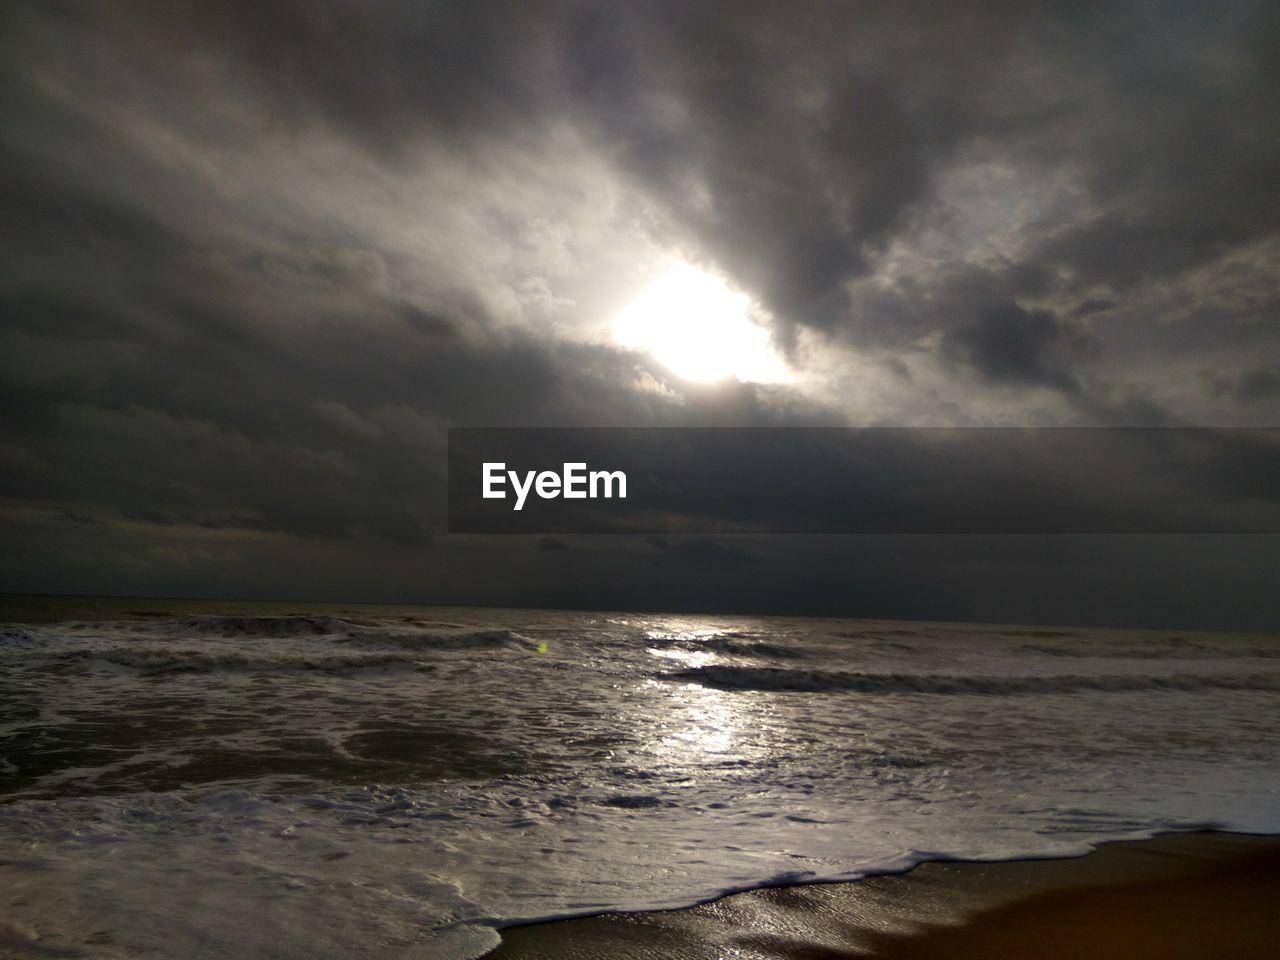 sky, sea, cloud - sky, water, beauty in nature, scenics - nature, land, beach, tranquility, tranquil scene, horizon, horizon over water, nature, no people, storm, overcast, idyllic, non-urban scene, outdoors, ominous